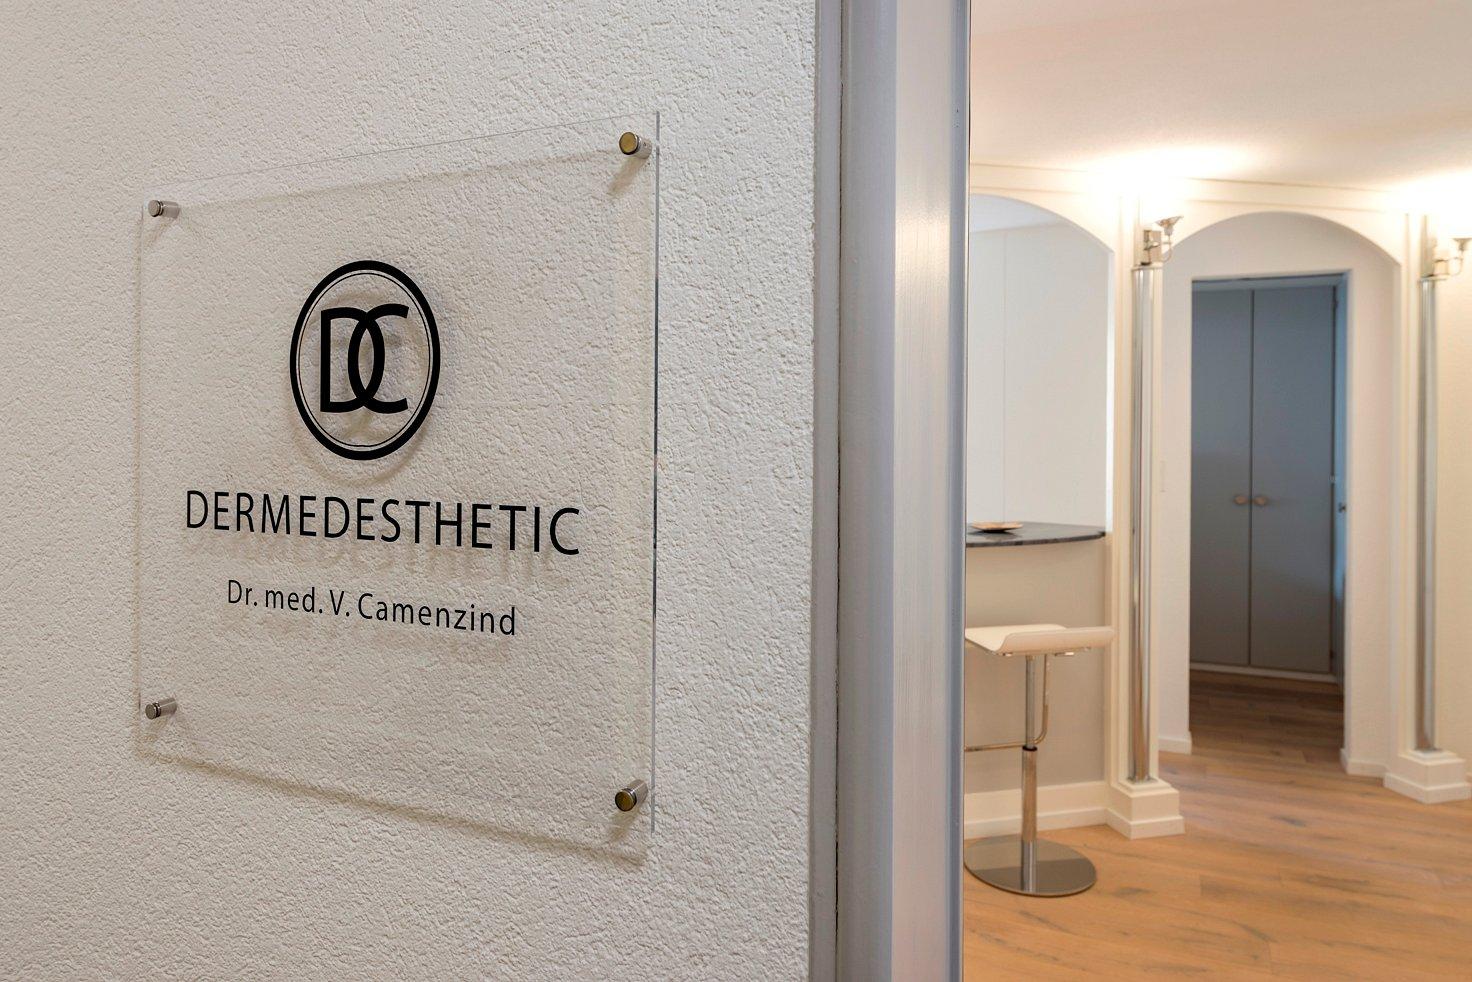 DERMEDESTHETIC GmbH